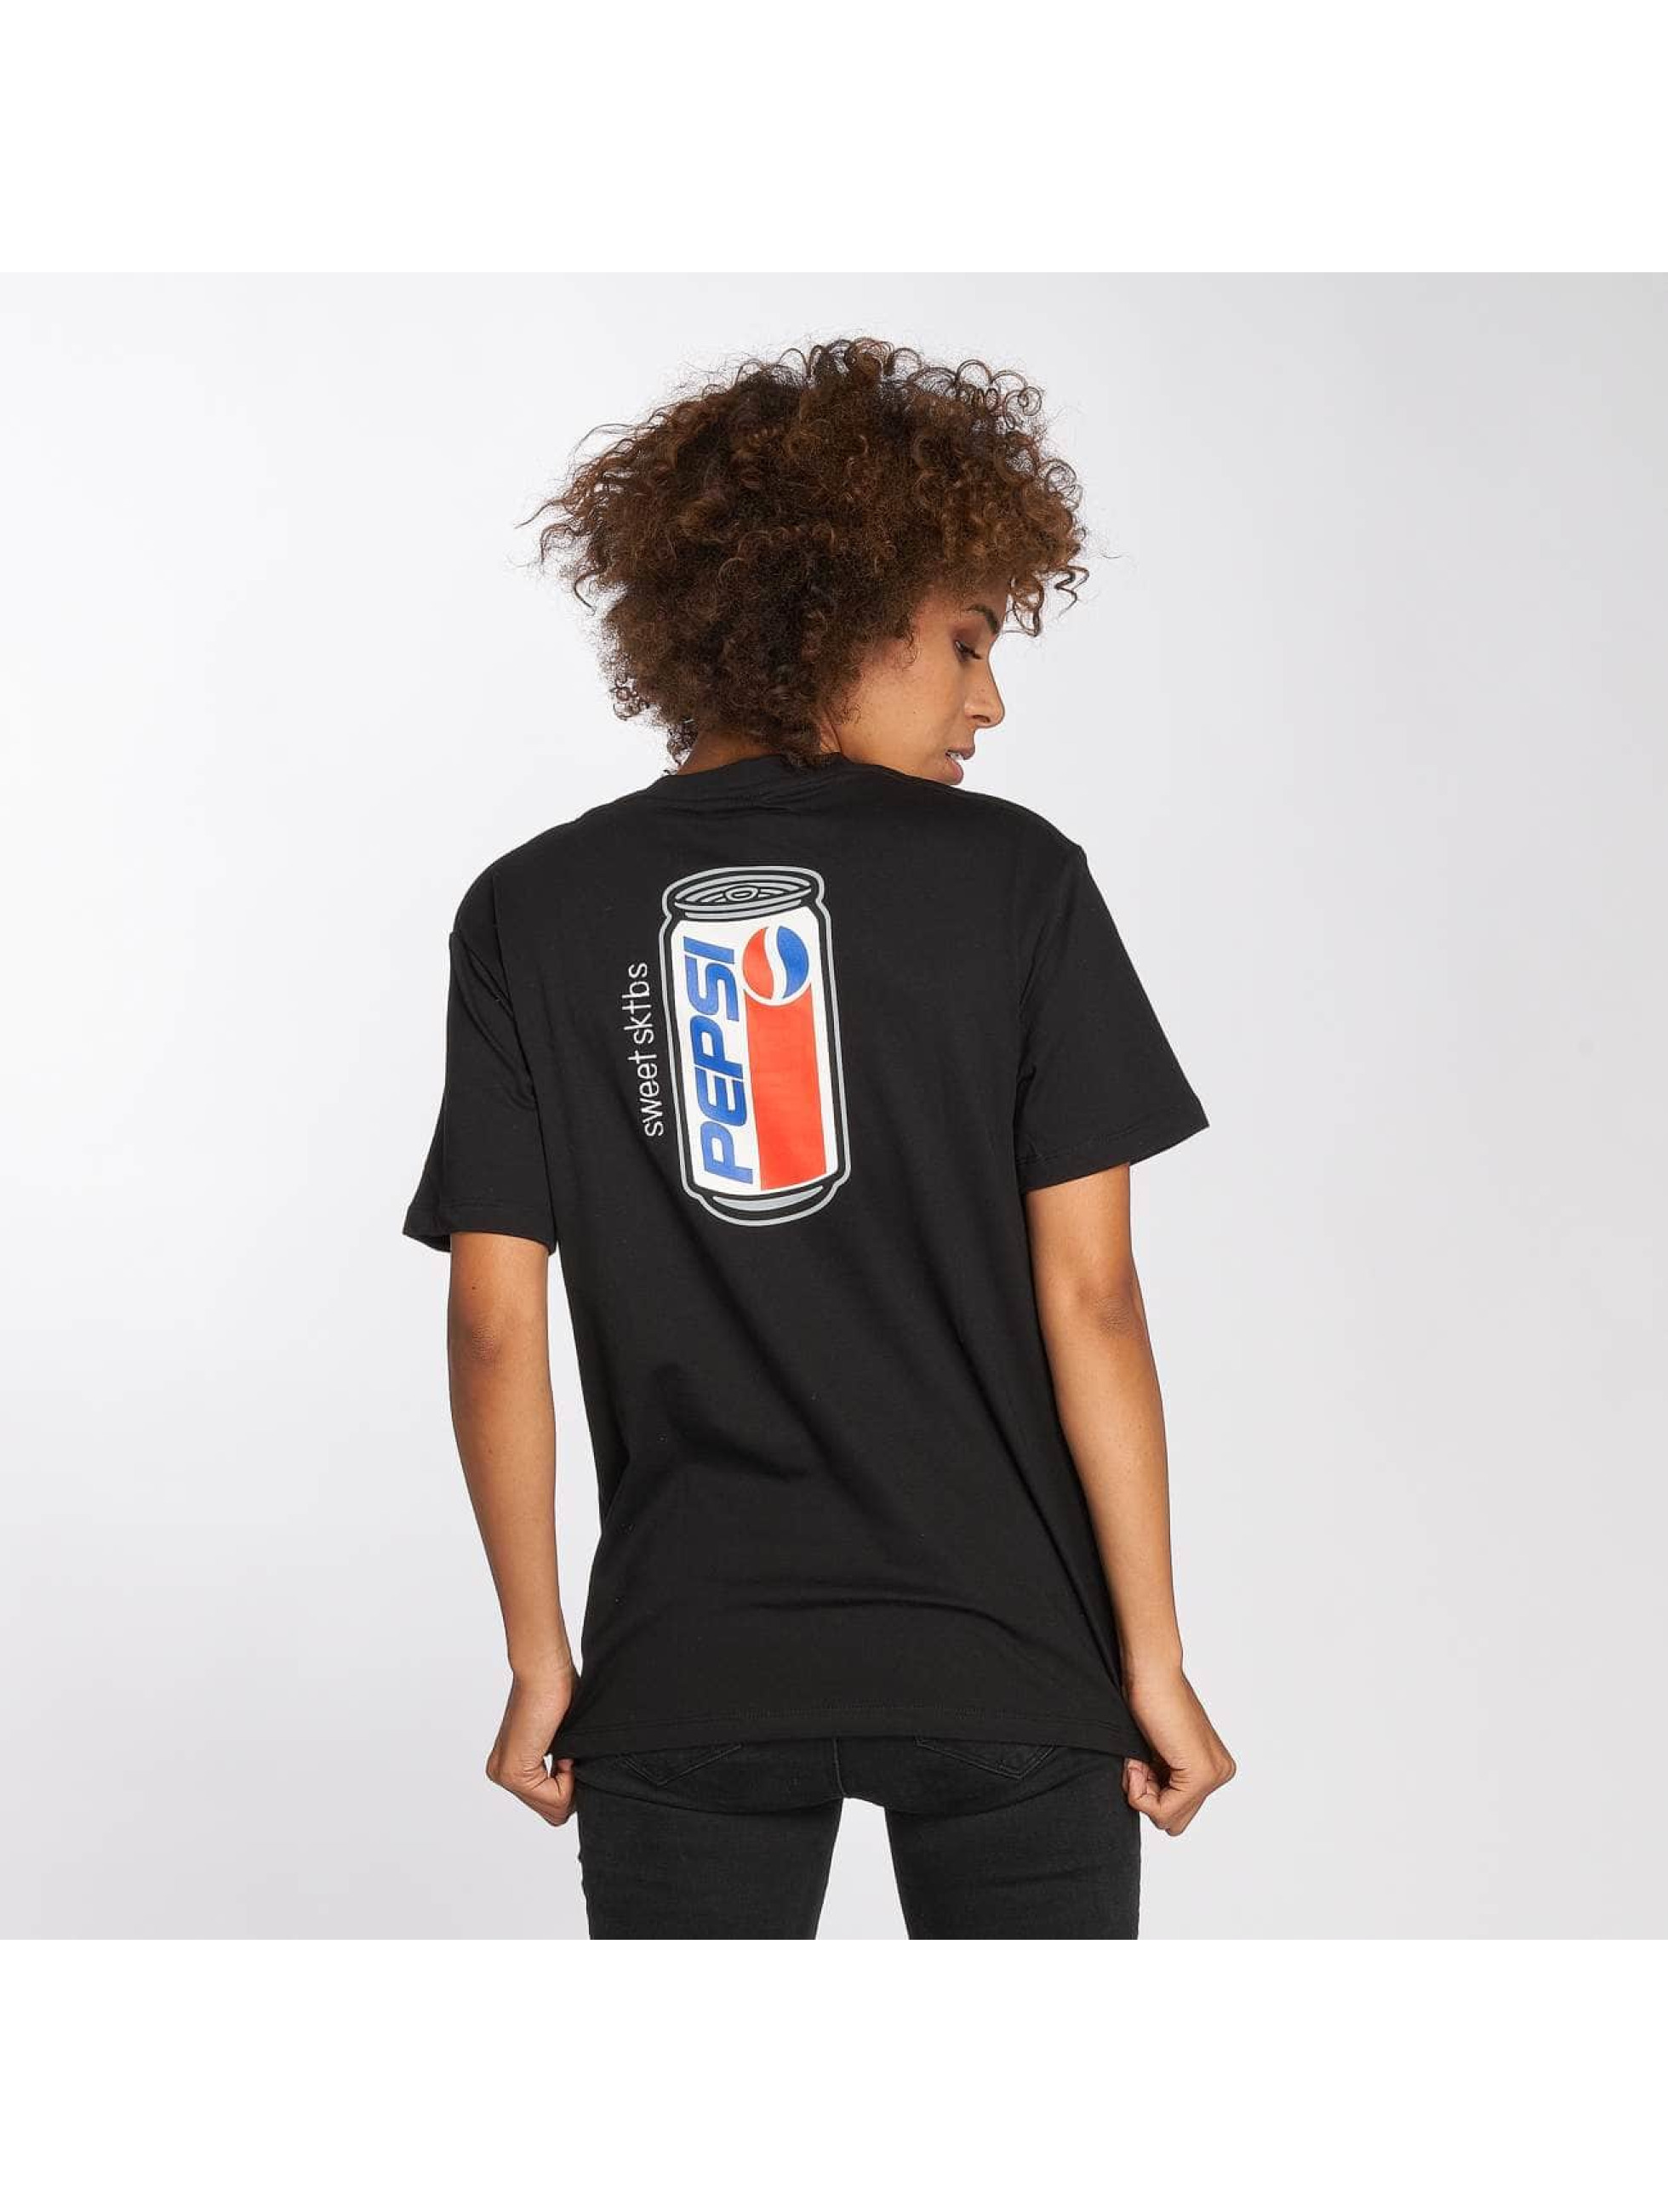 Sweet SKTBS T-Shirt Pepsi Can black